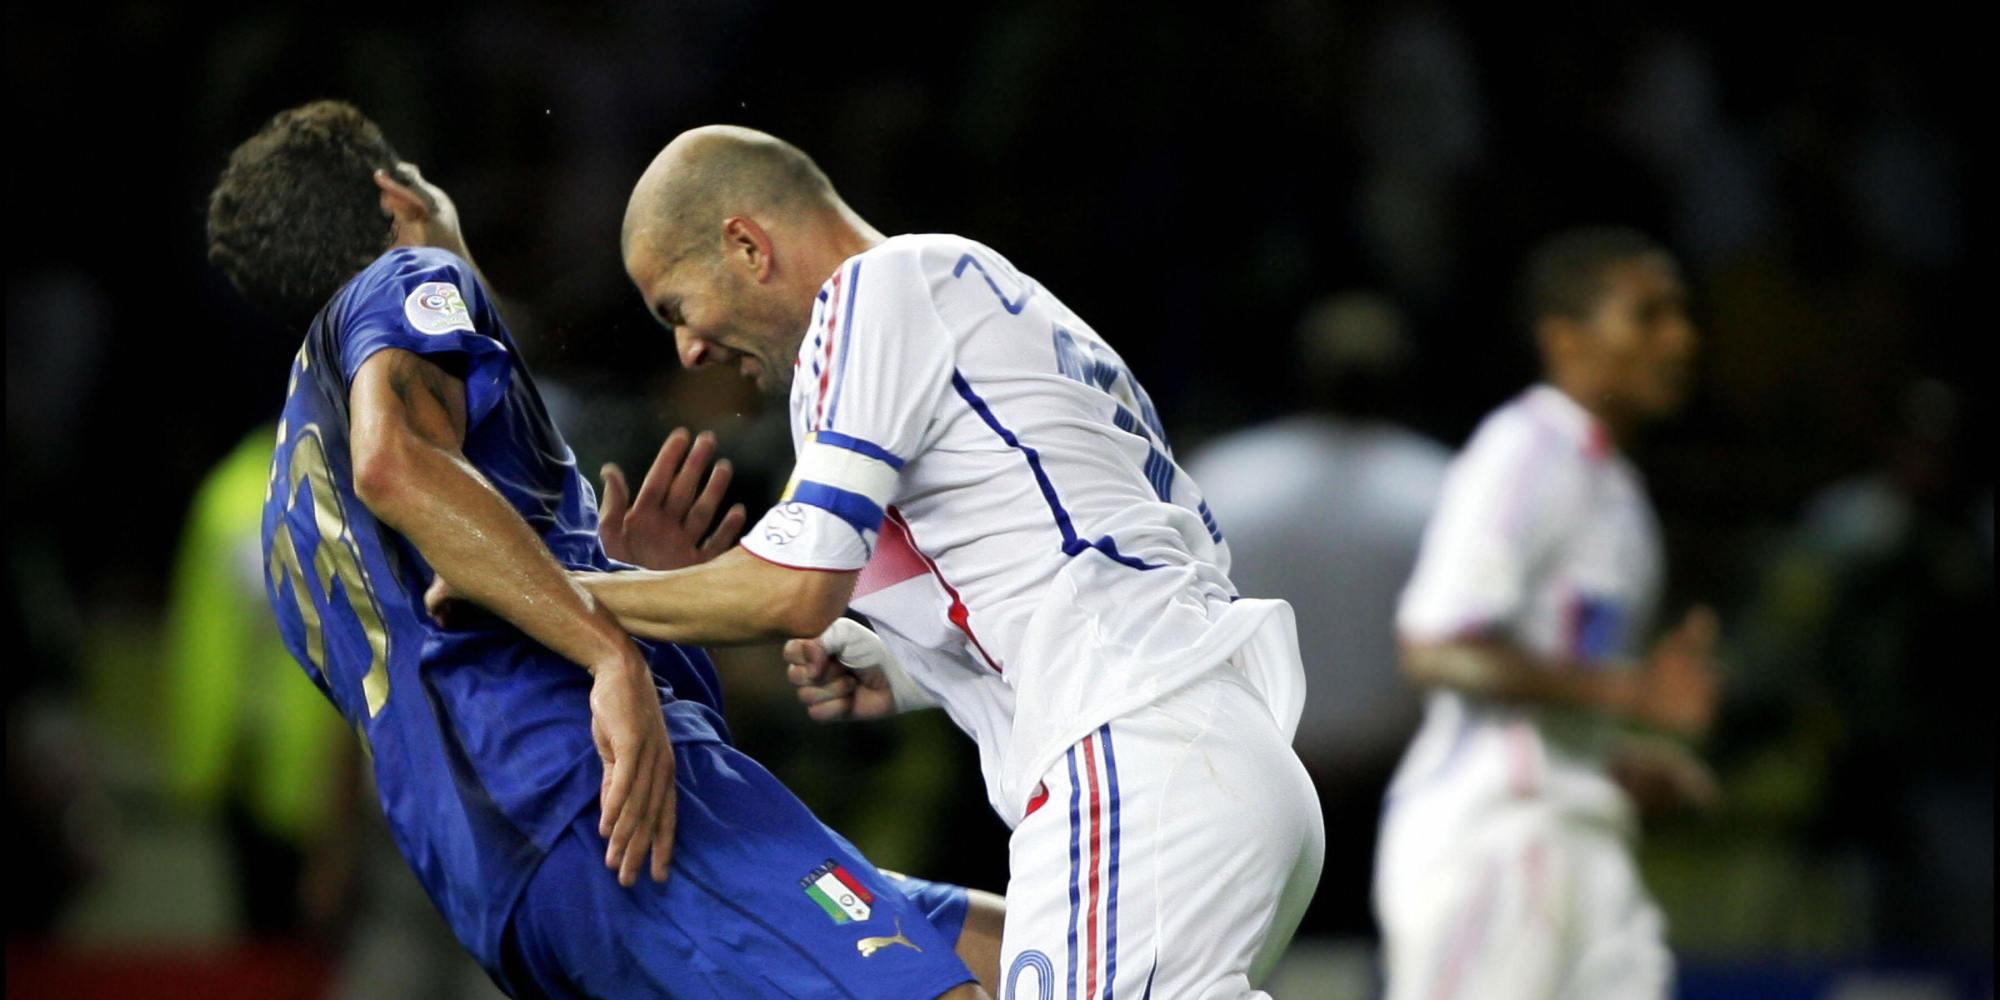 o-zidane-materazzi-facebook.jpg